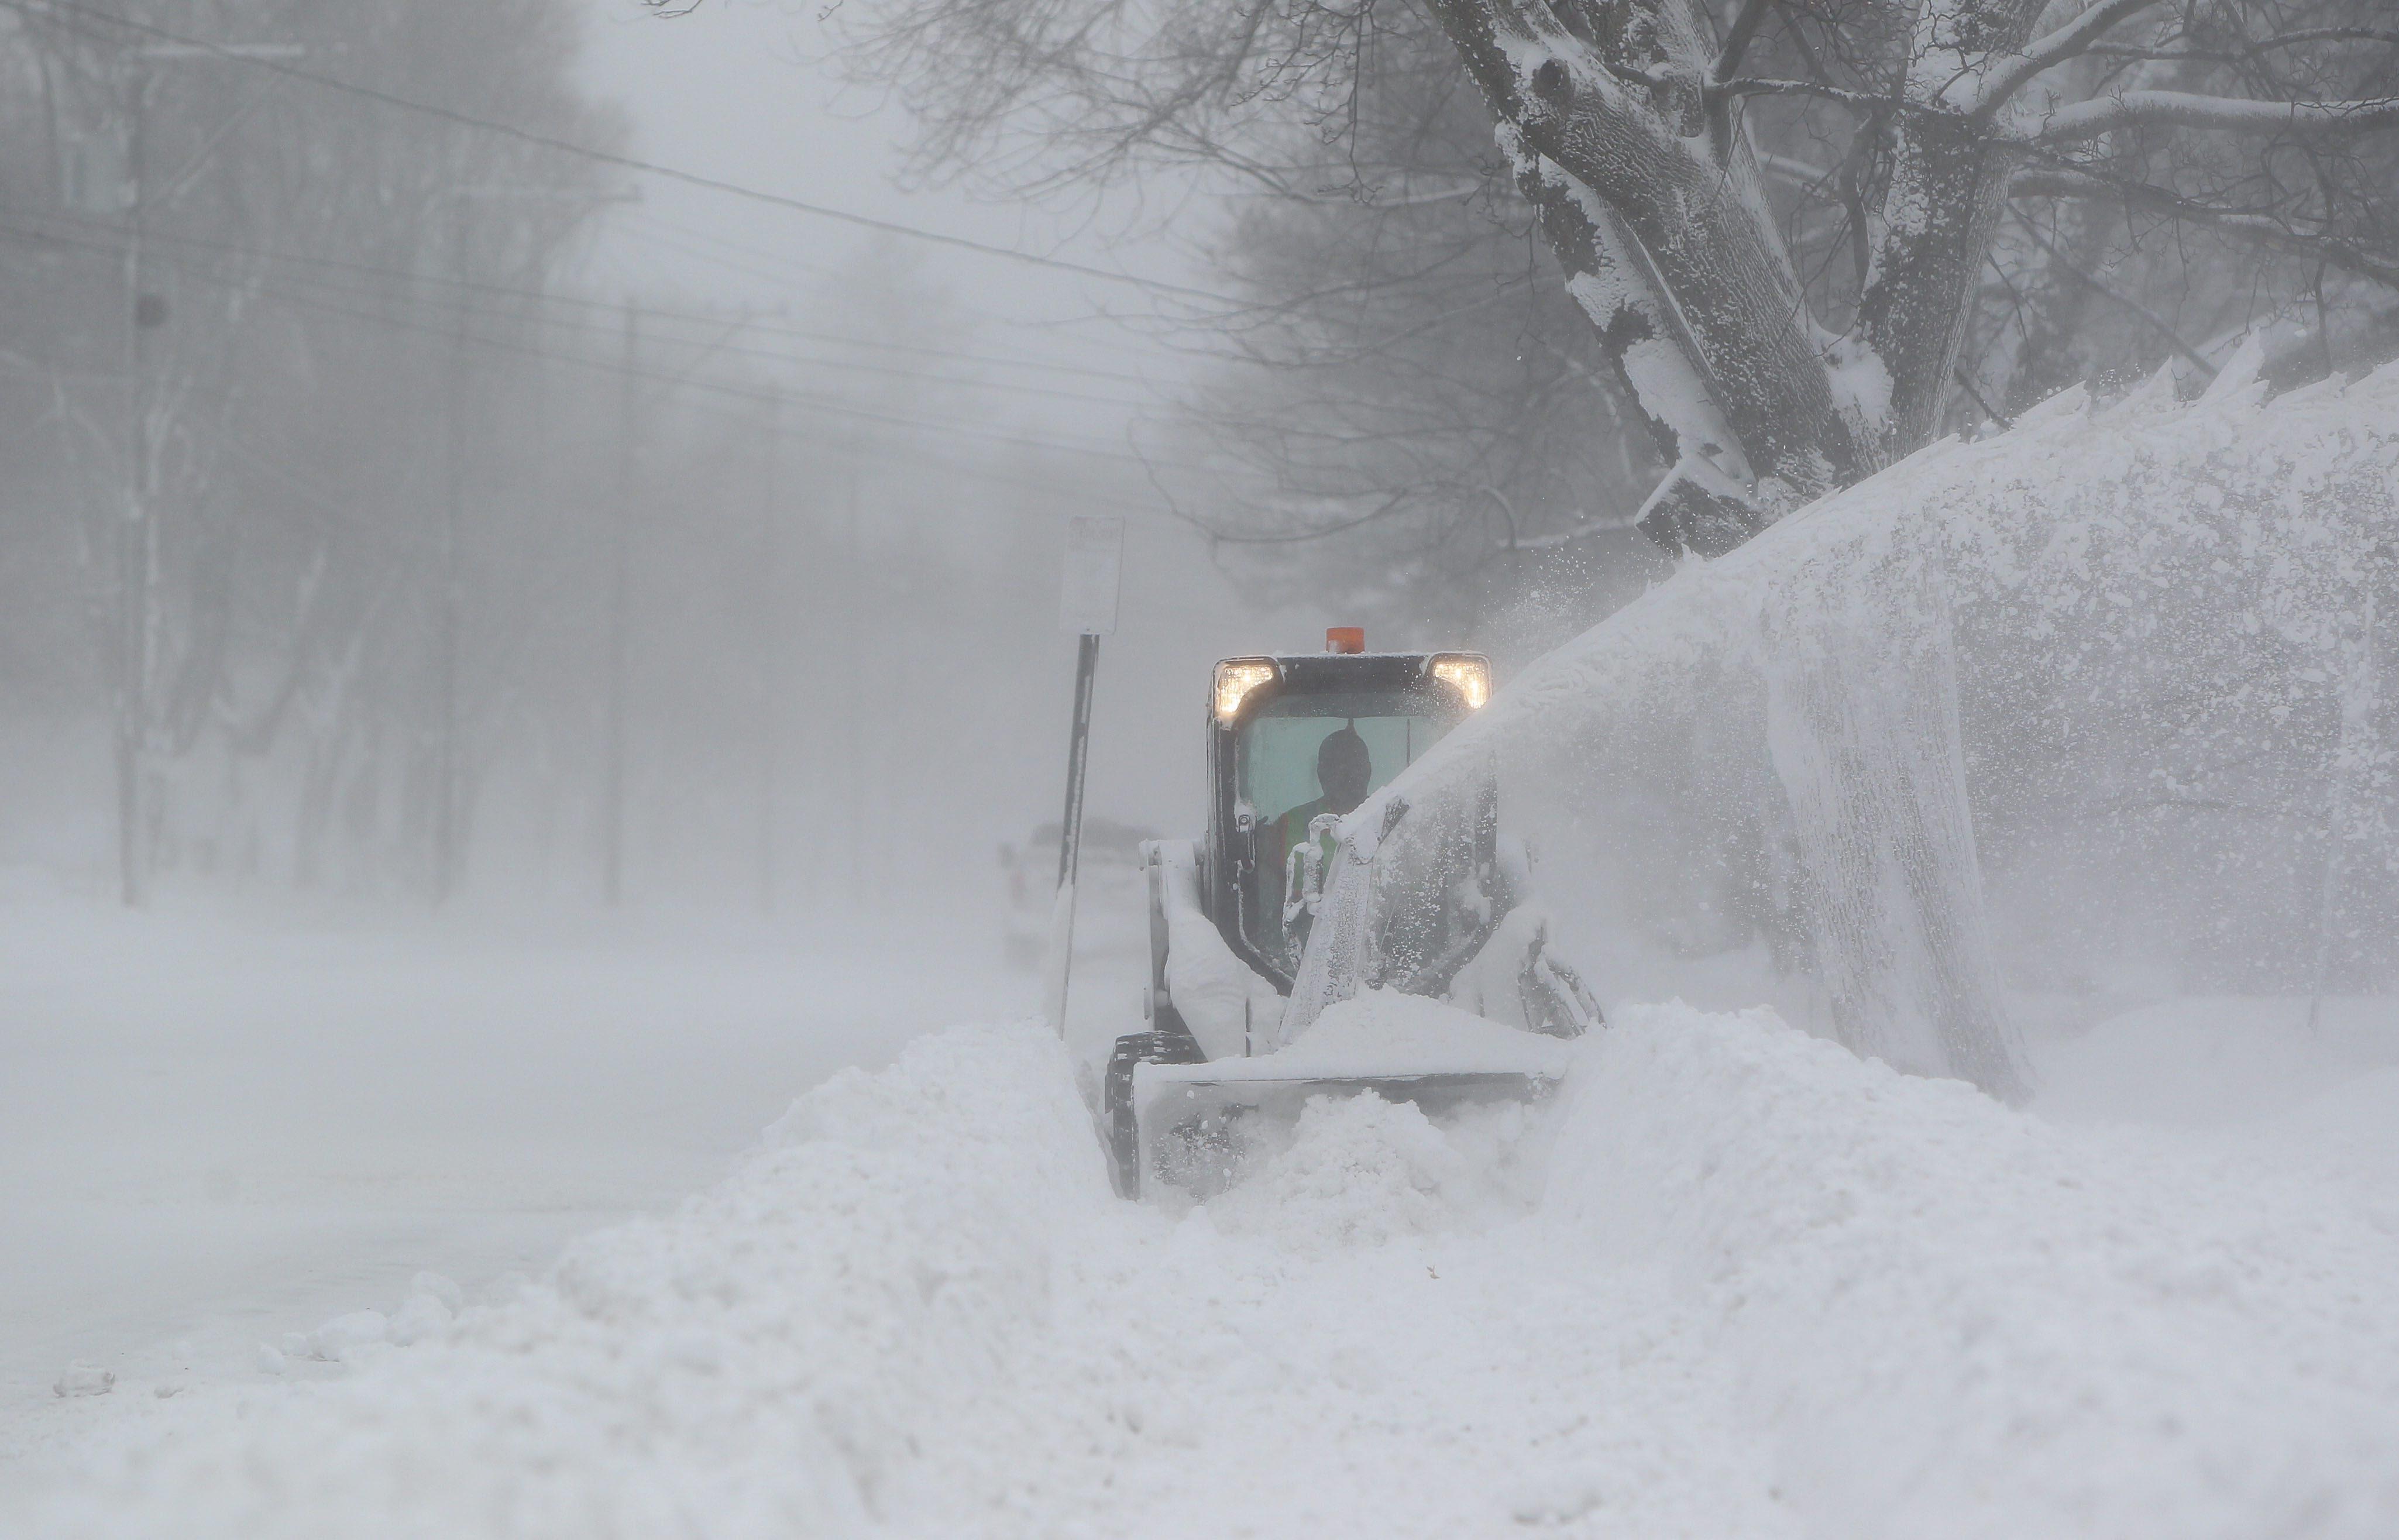 Crews clear the sidewalks on Buffalo Road in Orchard Park, Tuesday Jan. 7, 2014.  (Mark Mulville/Buffalo News)